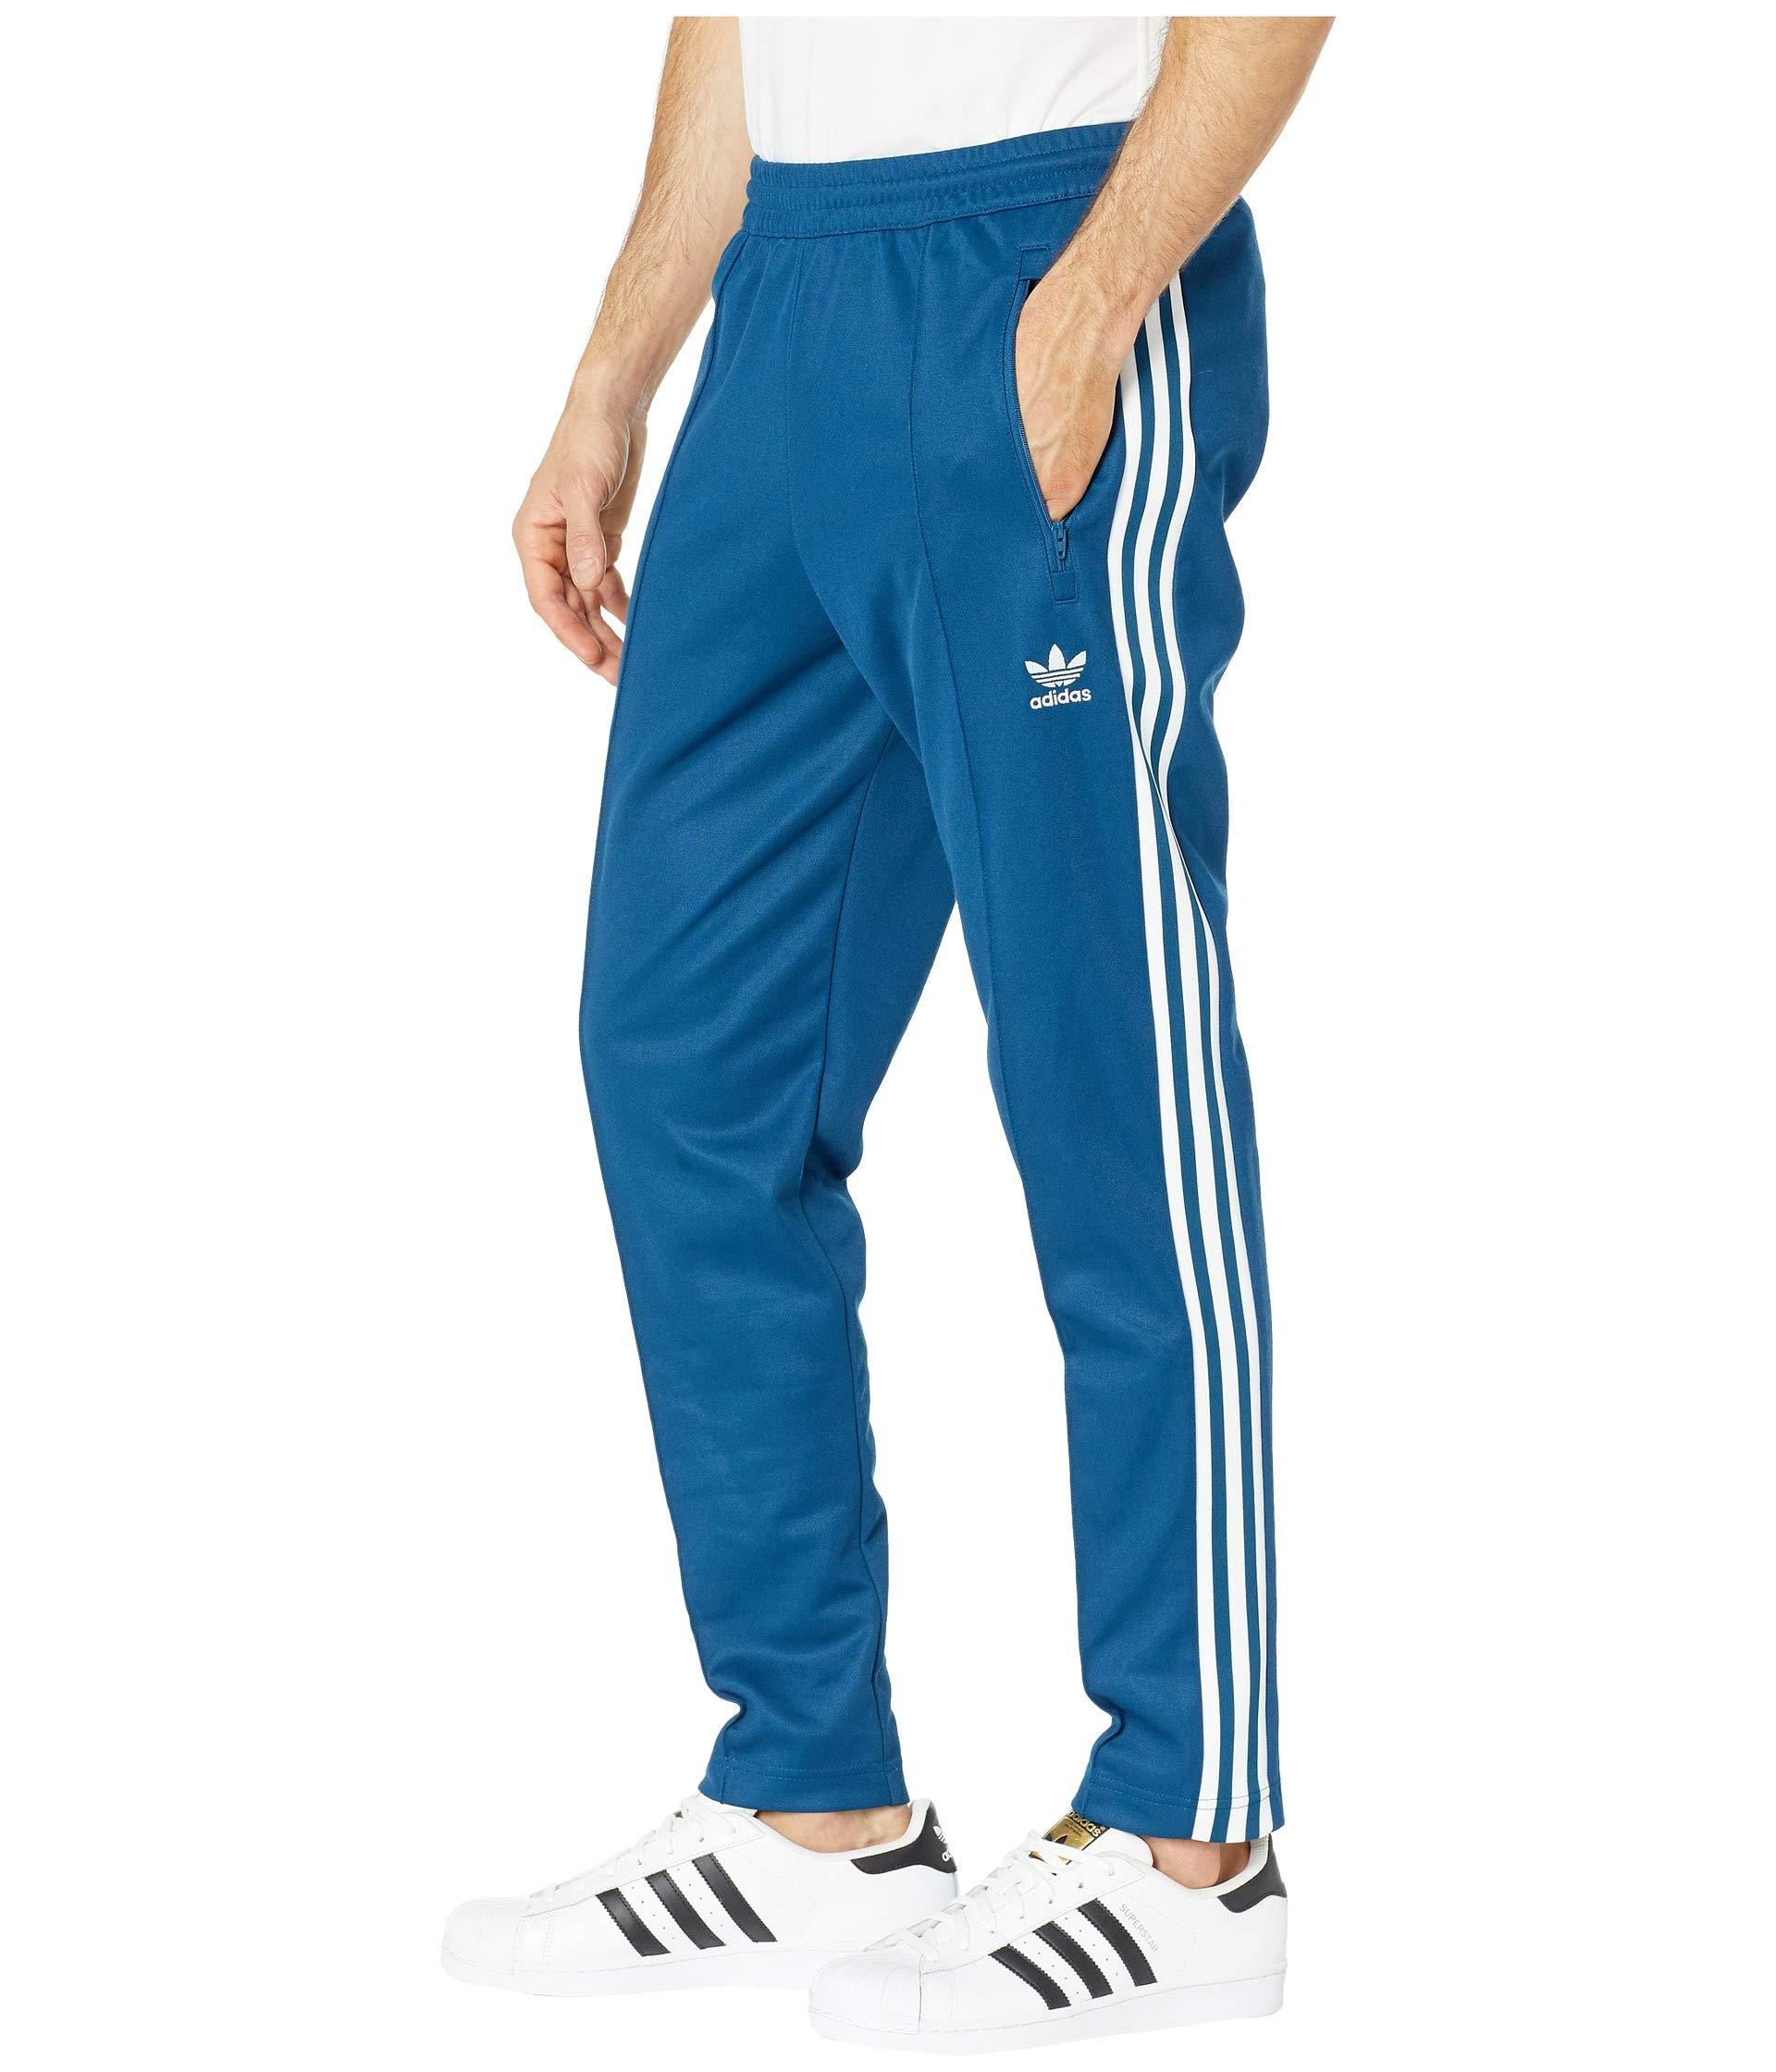 ADIDAS ORIGINALS BECKENBAUER Track Pants in Marine Blue